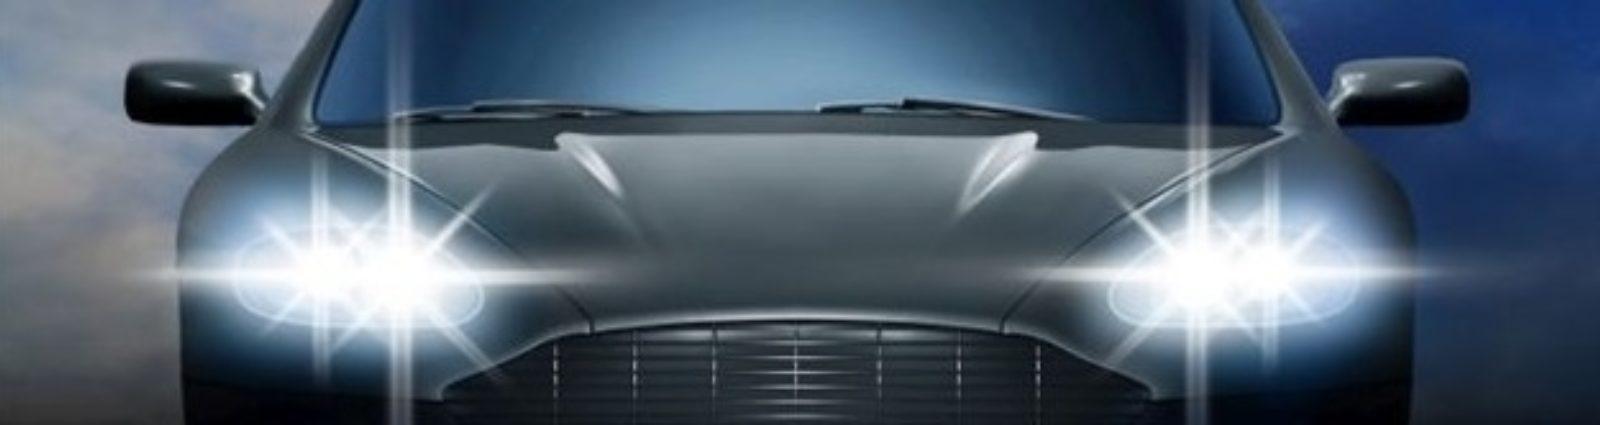 Car Headlights 628X290